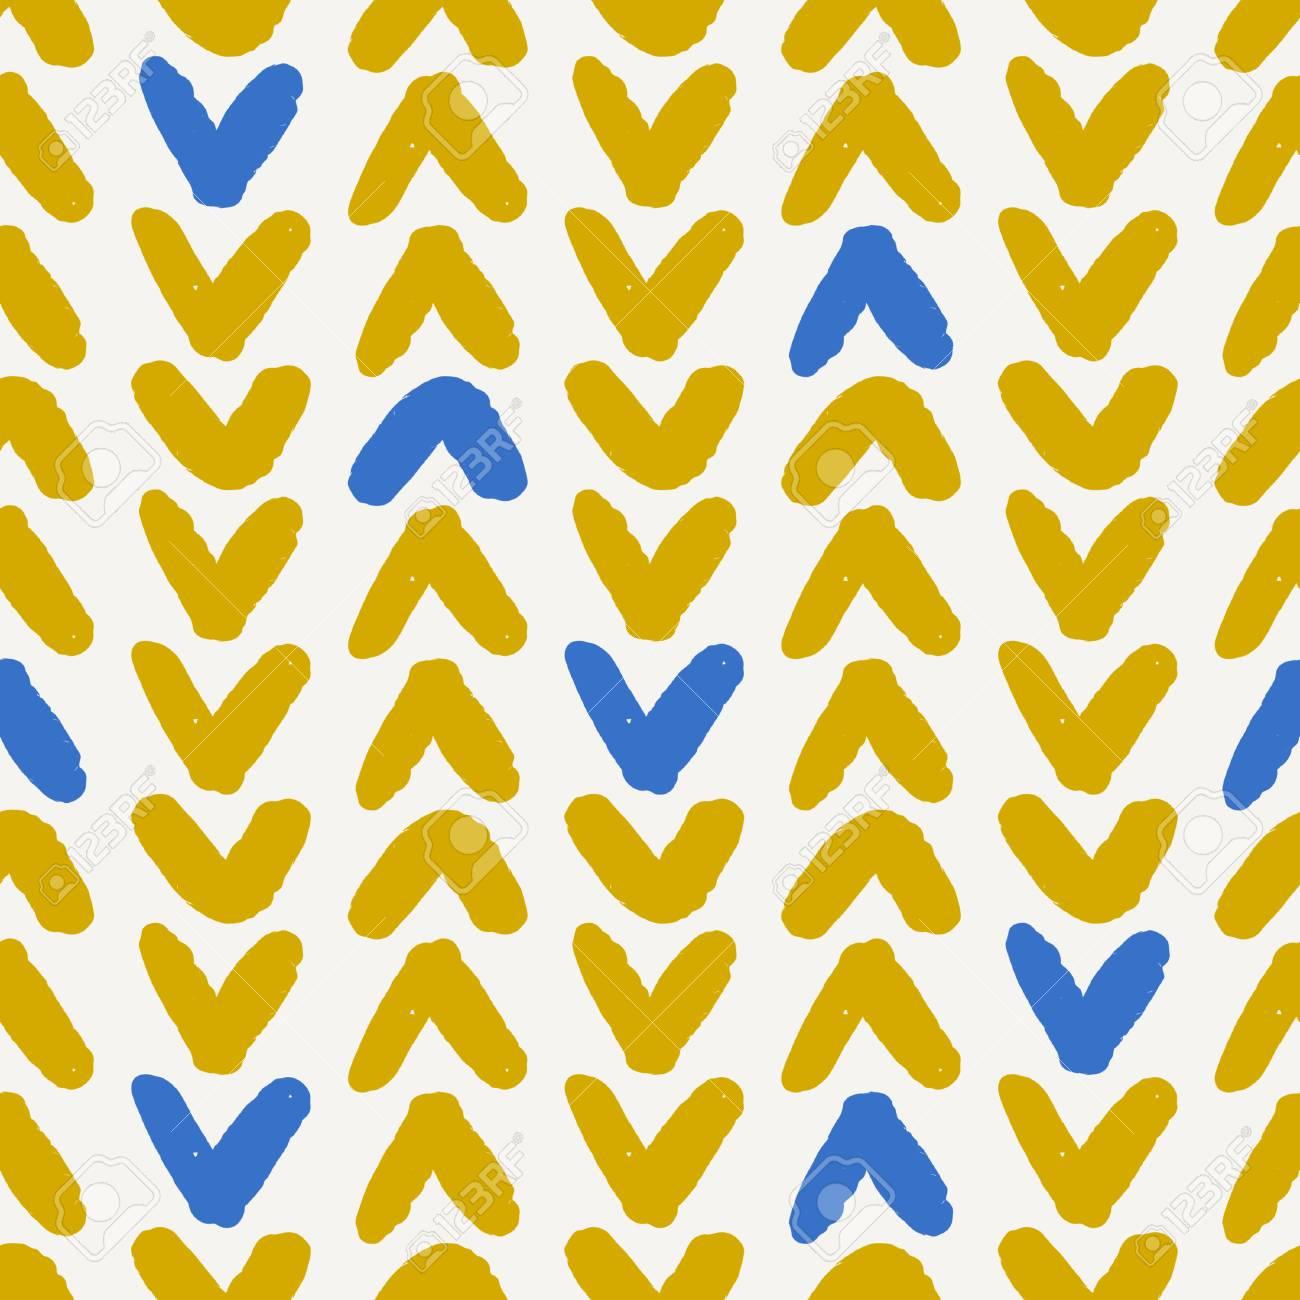 Hand Drawn Seamless Chevron Pattern In Blue, Yellow And Cream ...